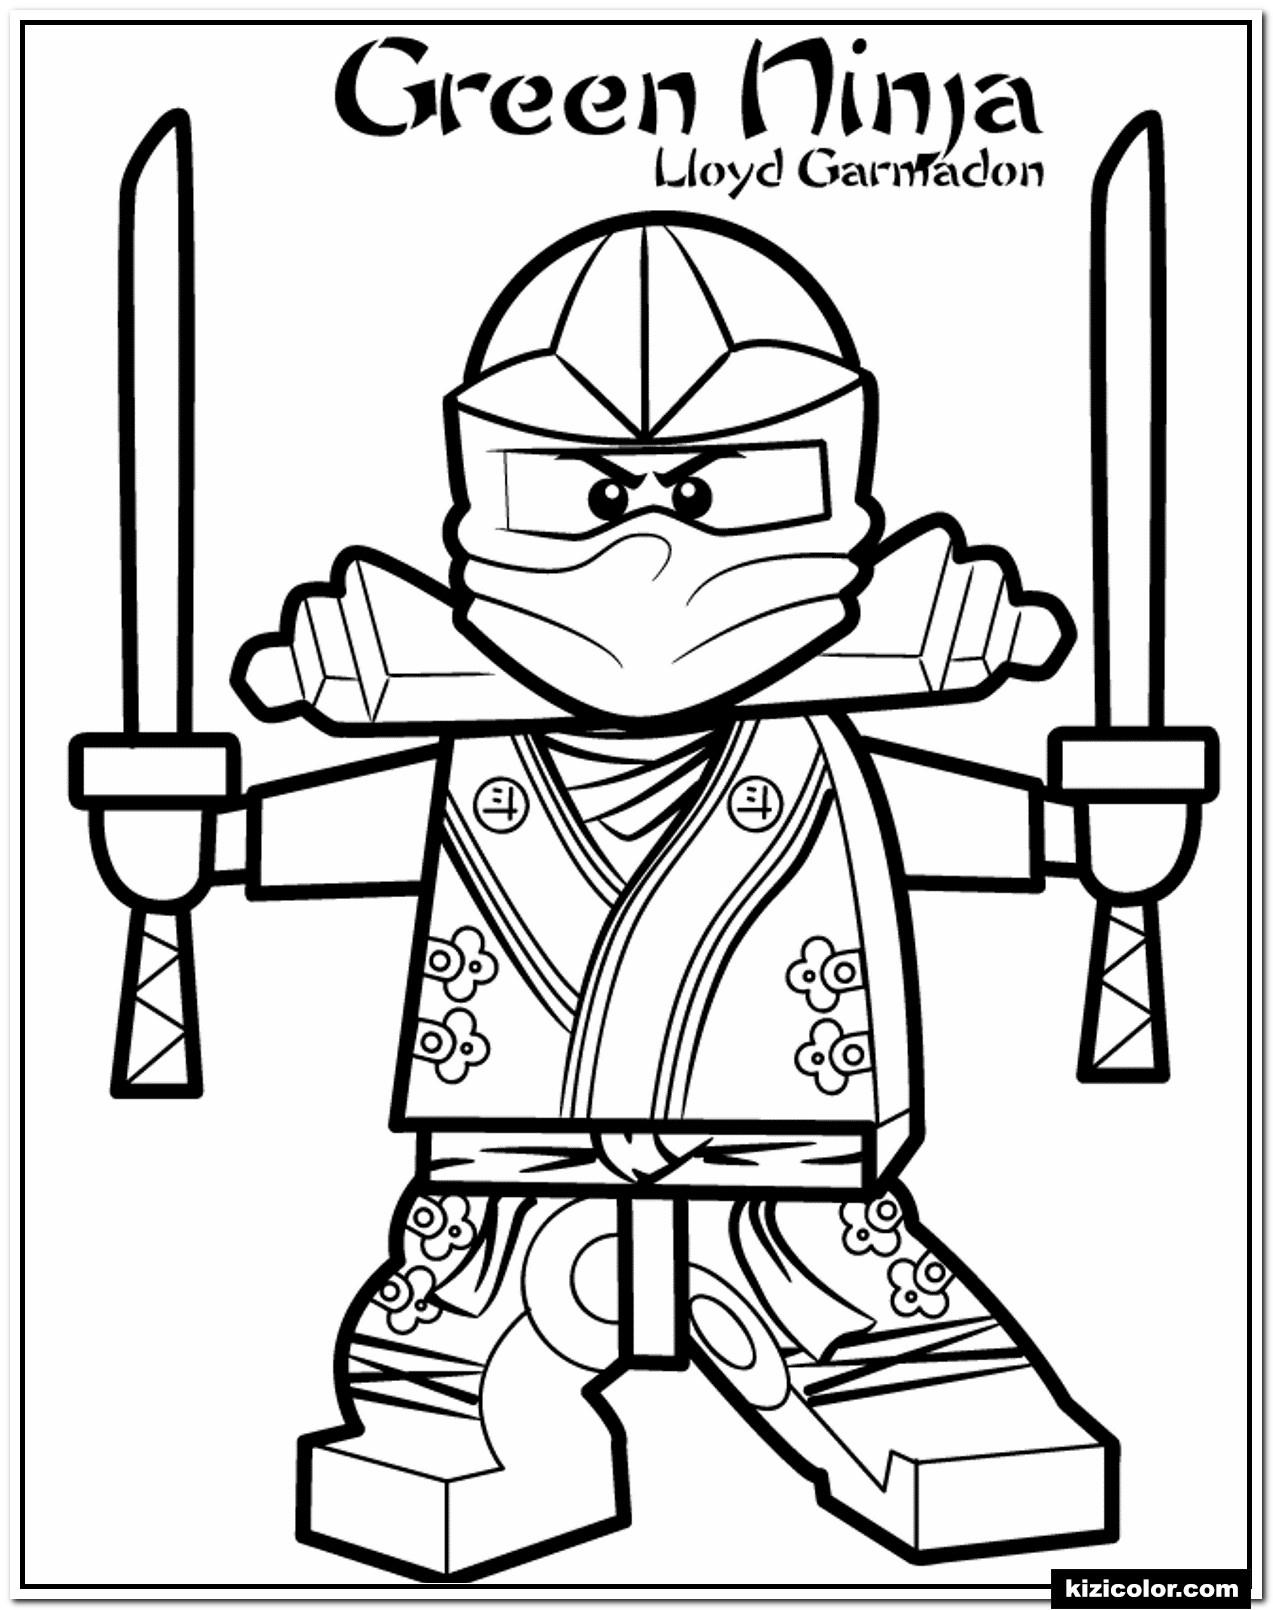 🎨 Gruner Ninja Ninjago - Ausmalbilder Kostenlos Zum Ausdrucken ganzes Ninjago Ausmalbilder Kostenlos Drucken